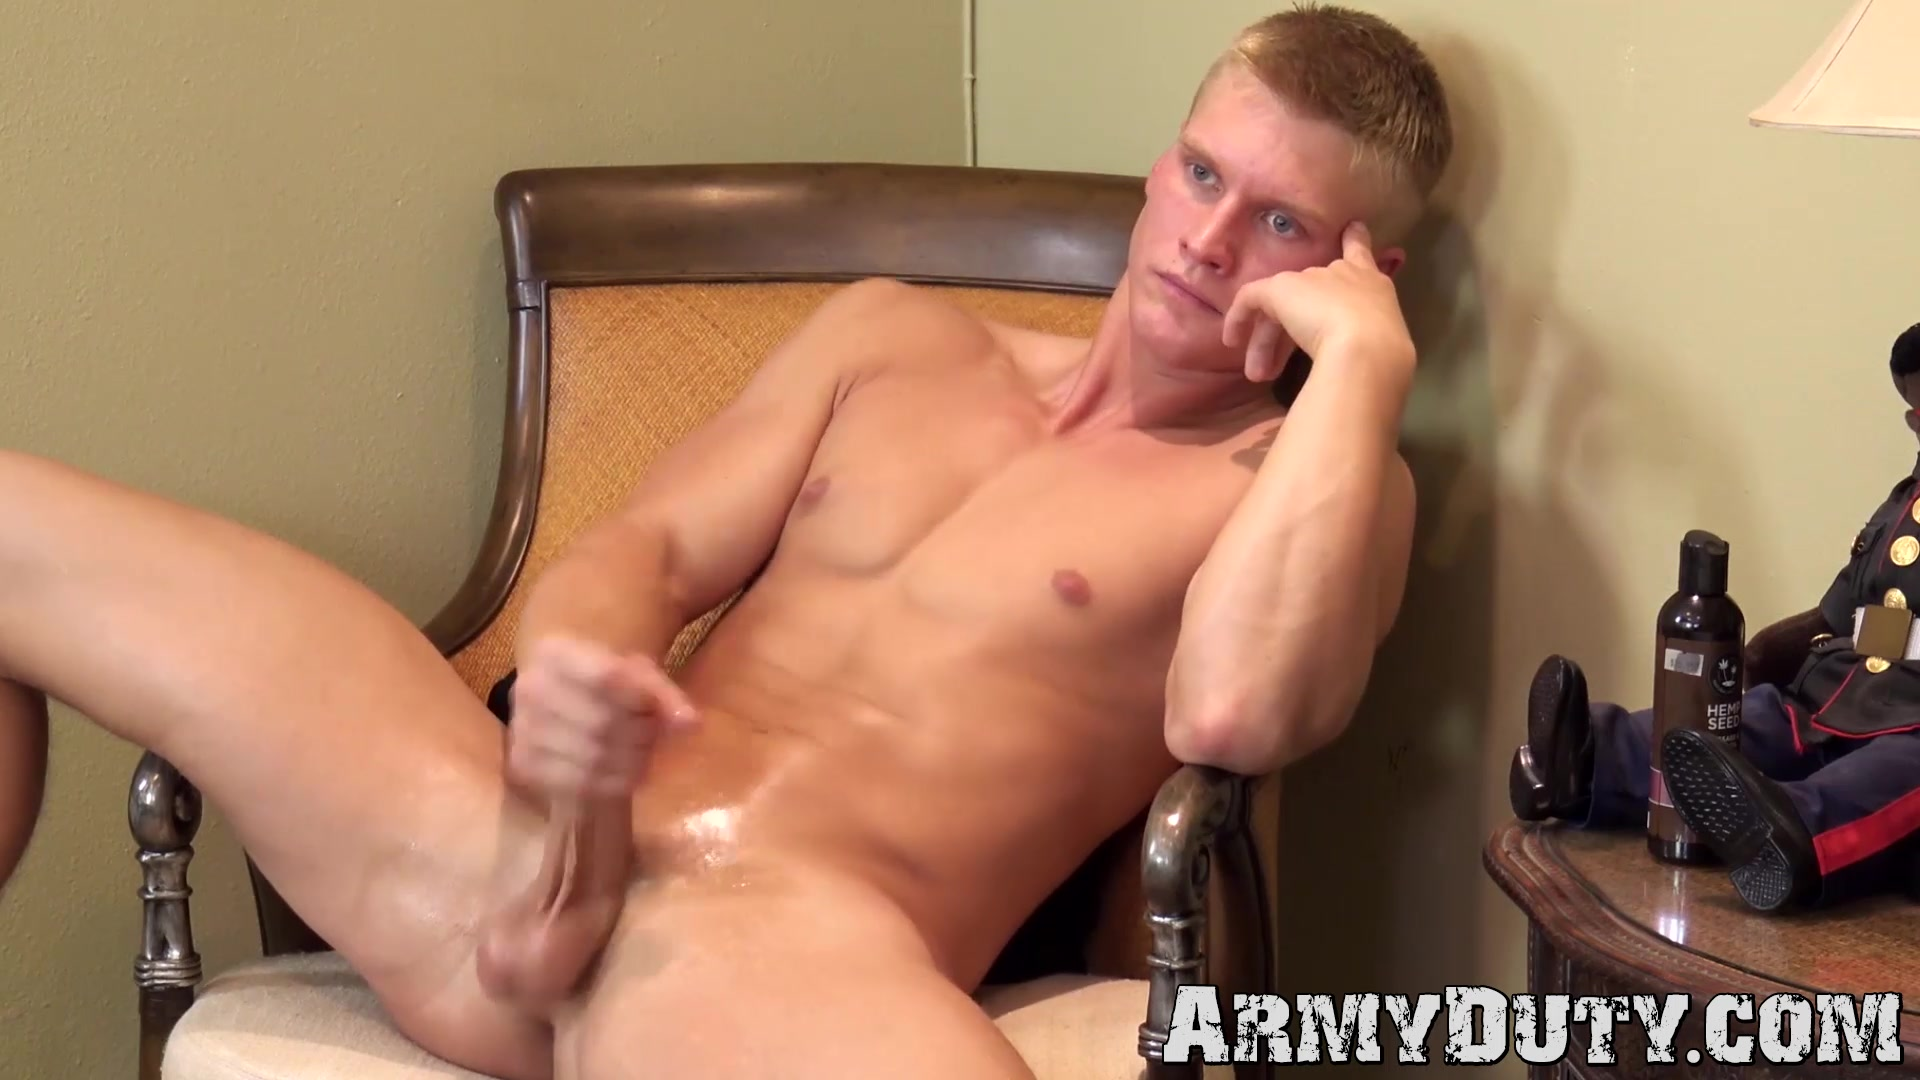 Black dude tugs his long cock